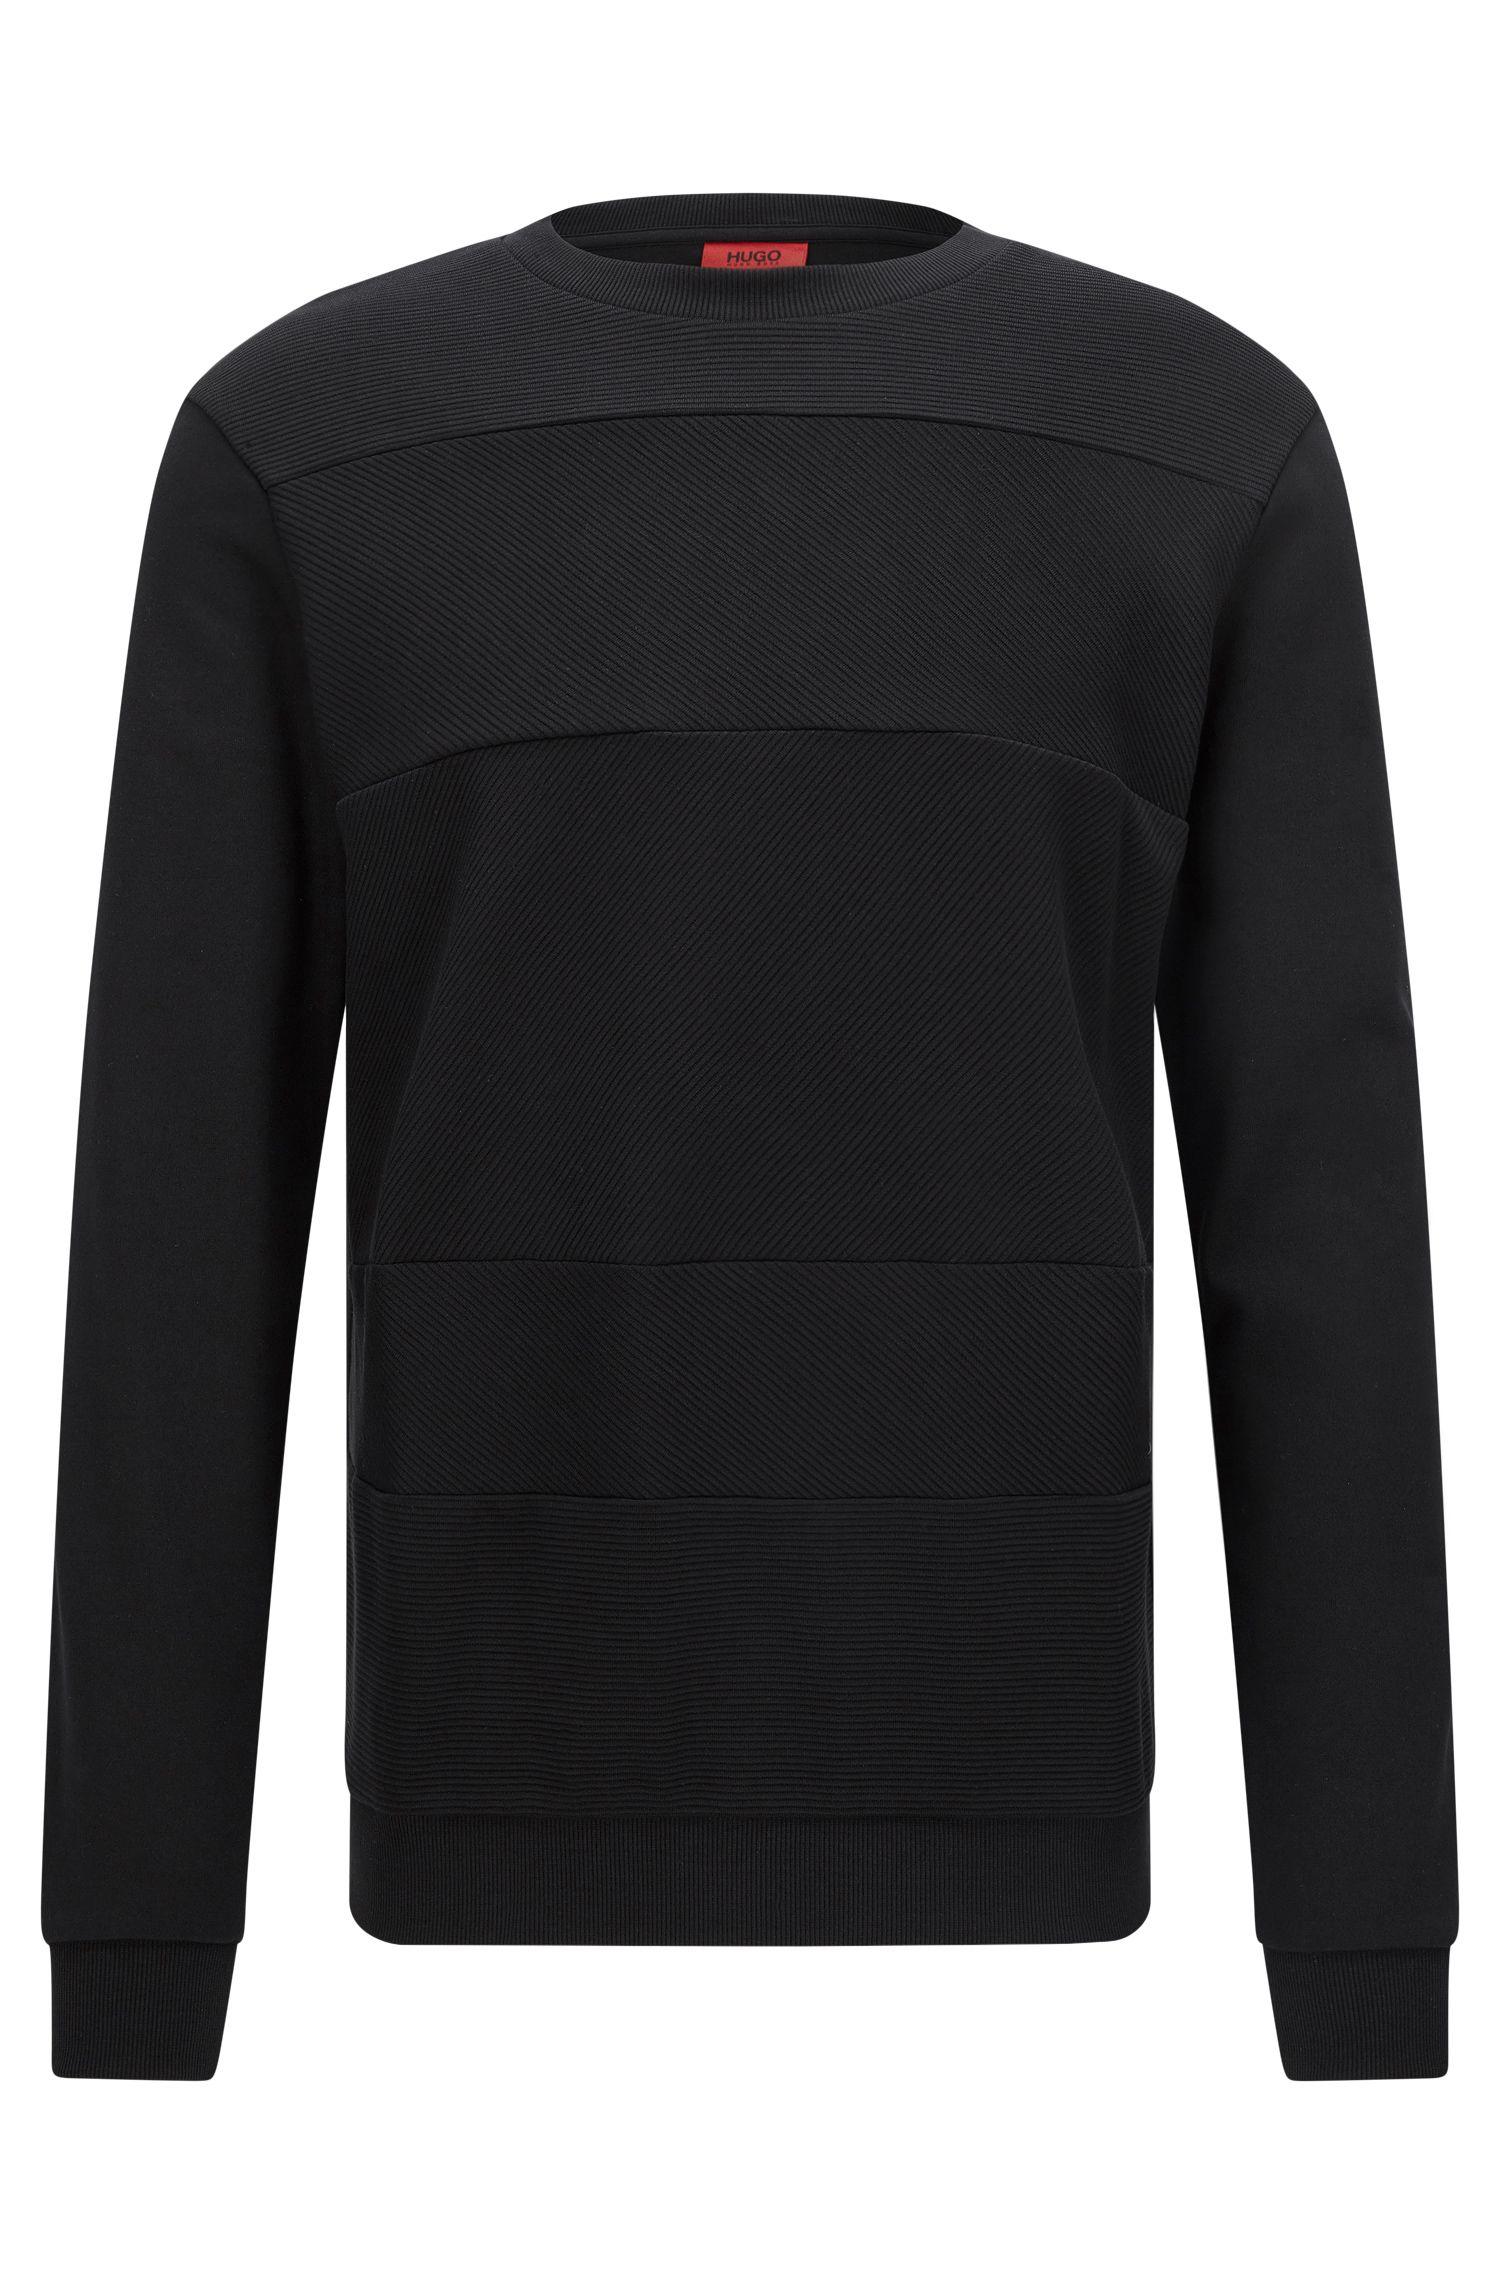 'Dyatt'   Textured Cotton Sweater, Black